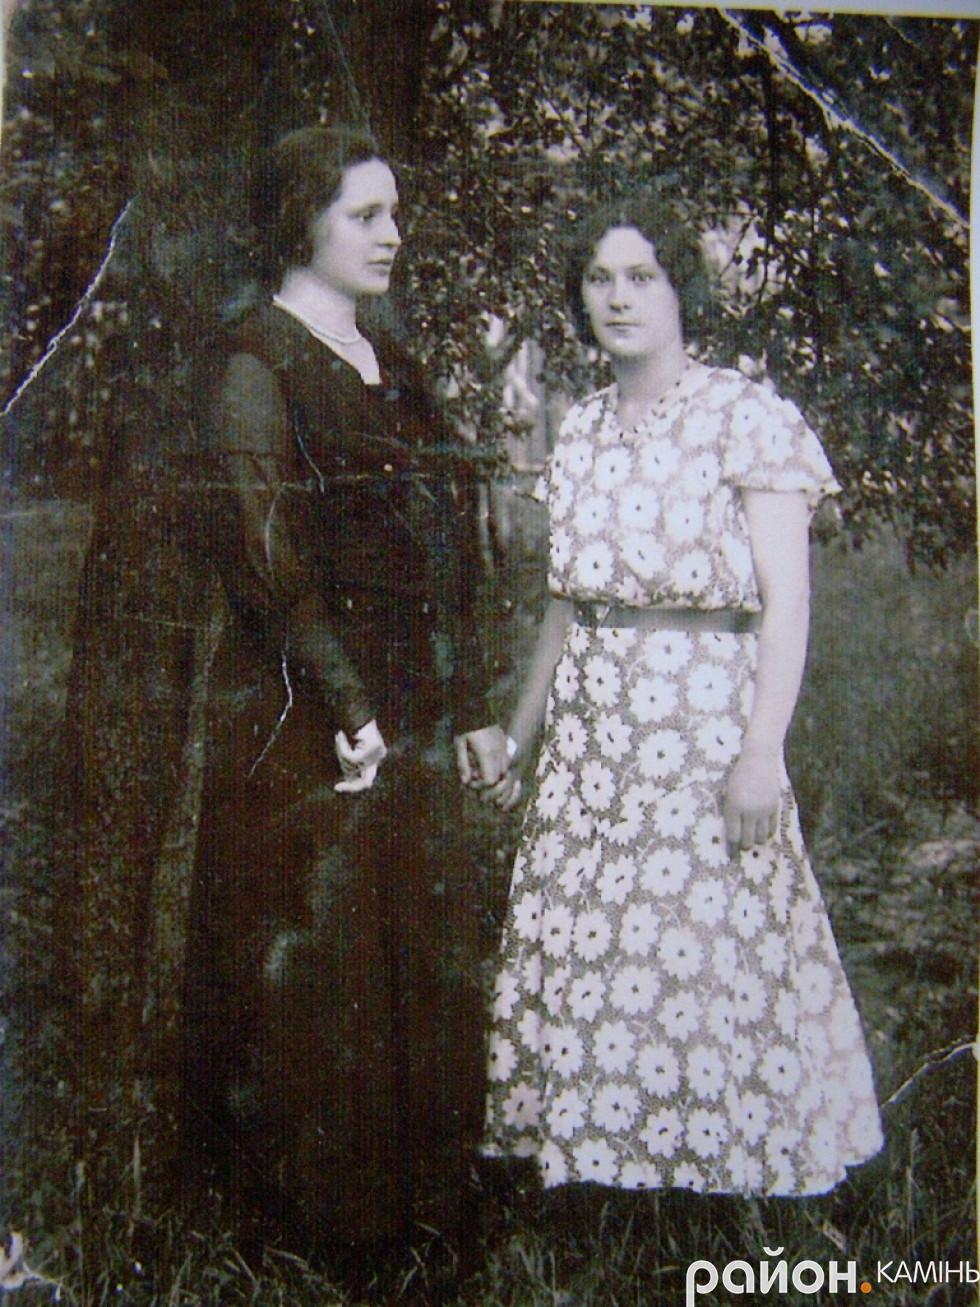 Неоніла (зліва) і Марфа (справа) Буйницькі. Сер. 20-х років ХХ ст.